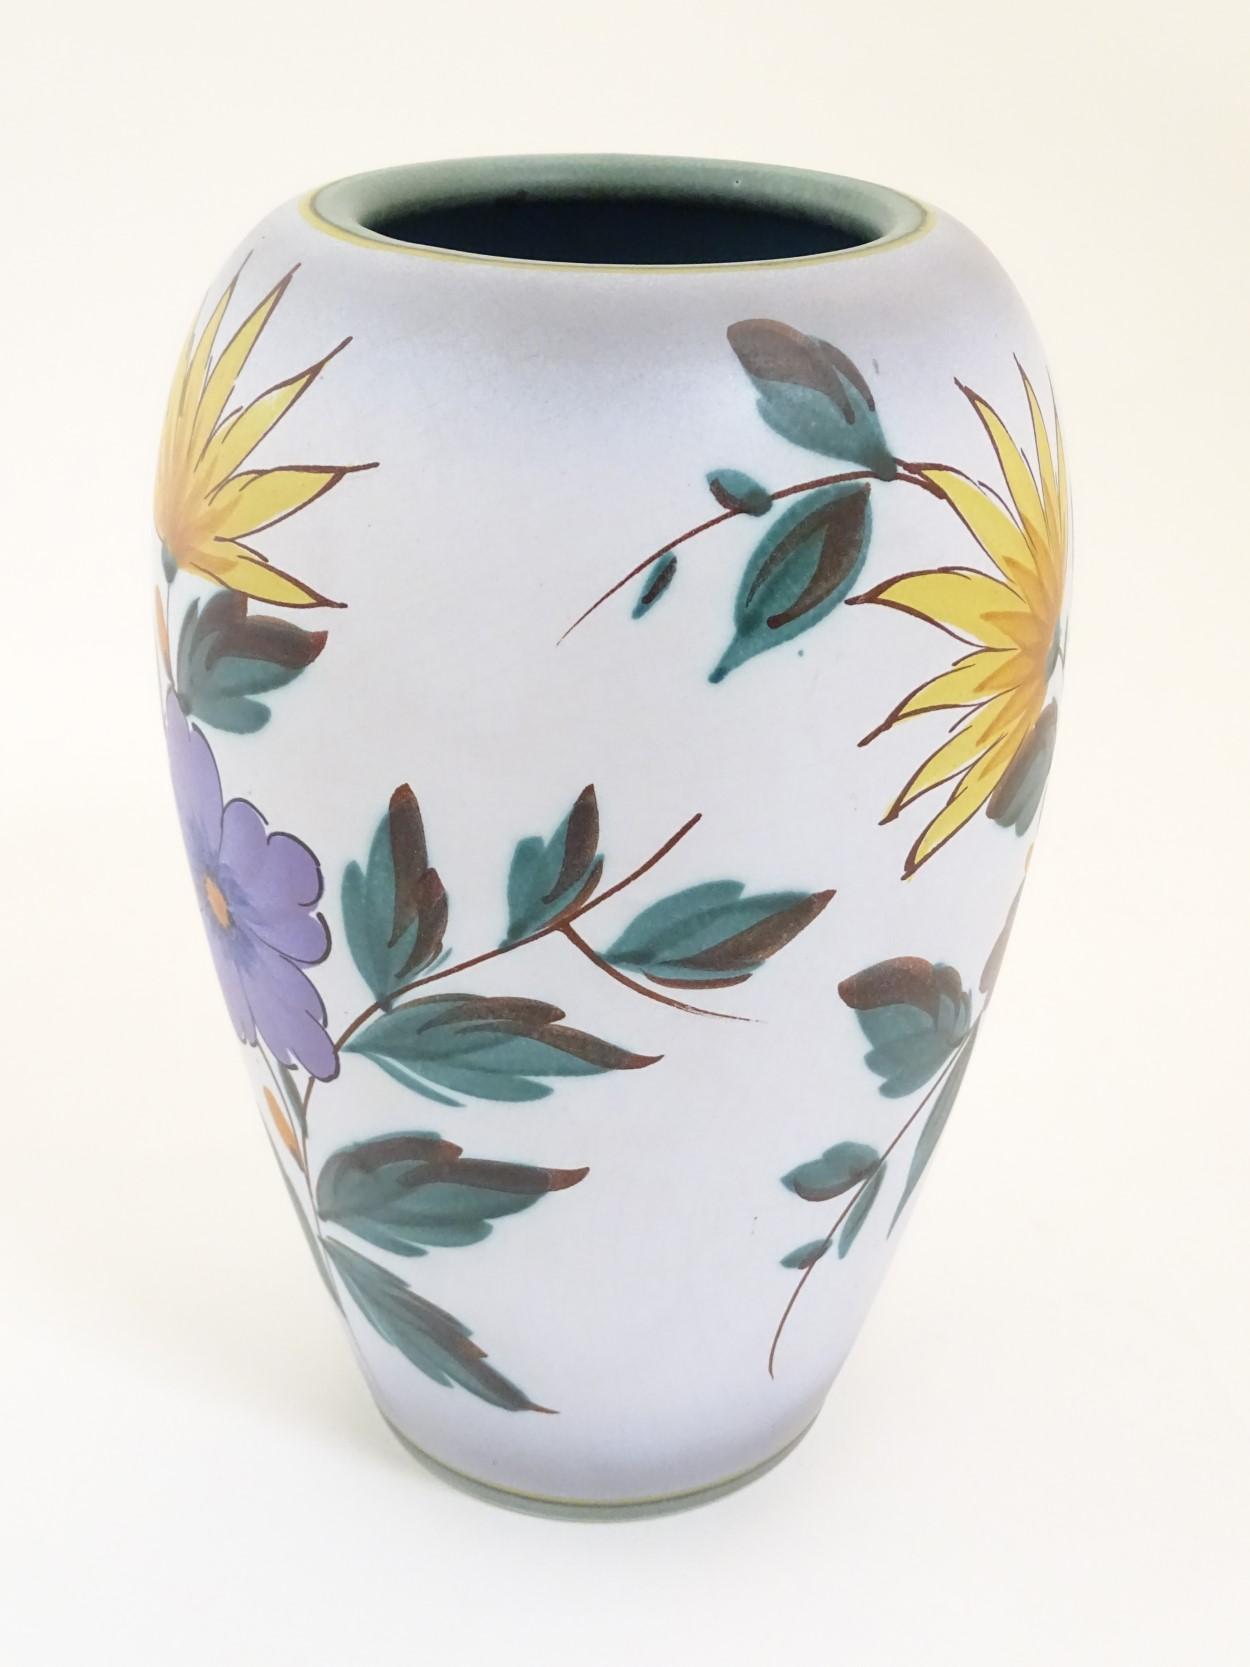 Lot 58 - A Viola pattern Gouda vase. Marked under 1493, Flora Gouda, Holland, Viola. Height: approx.